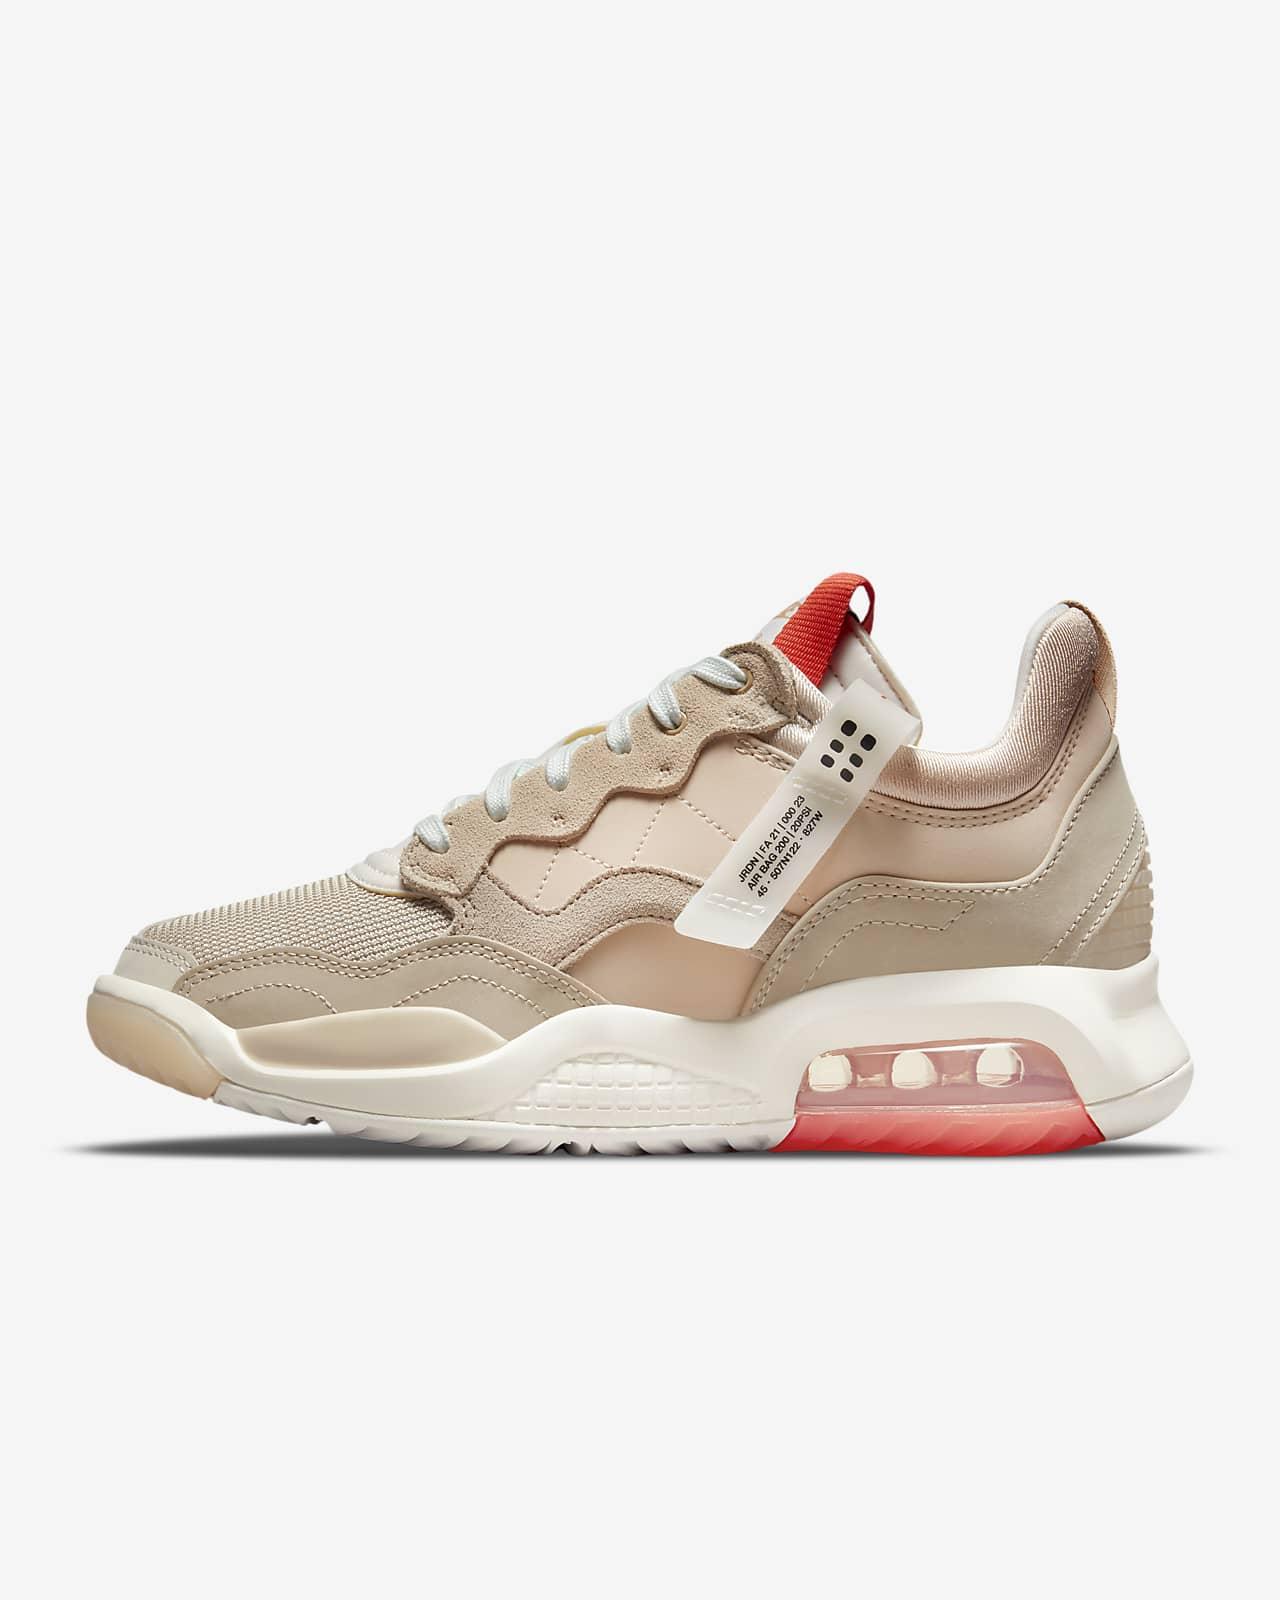 Chaussure Jordan MA2